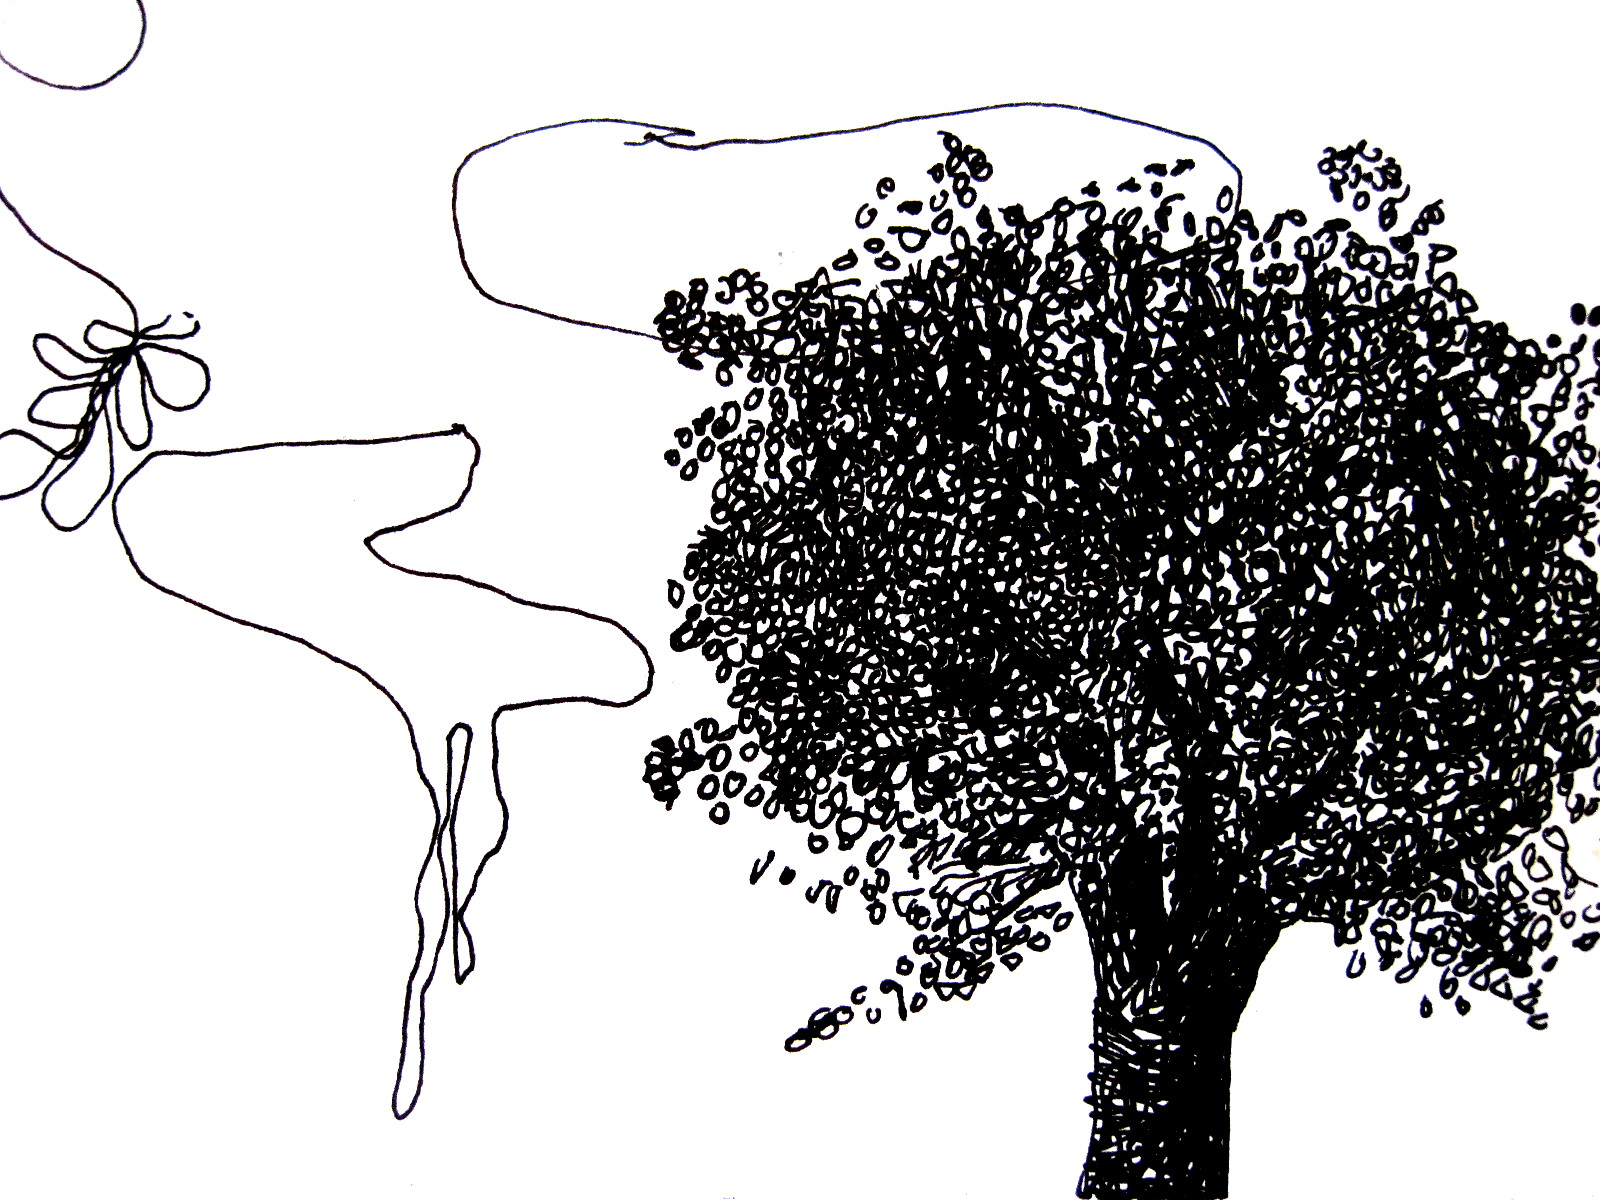 curly_tree2.jpg